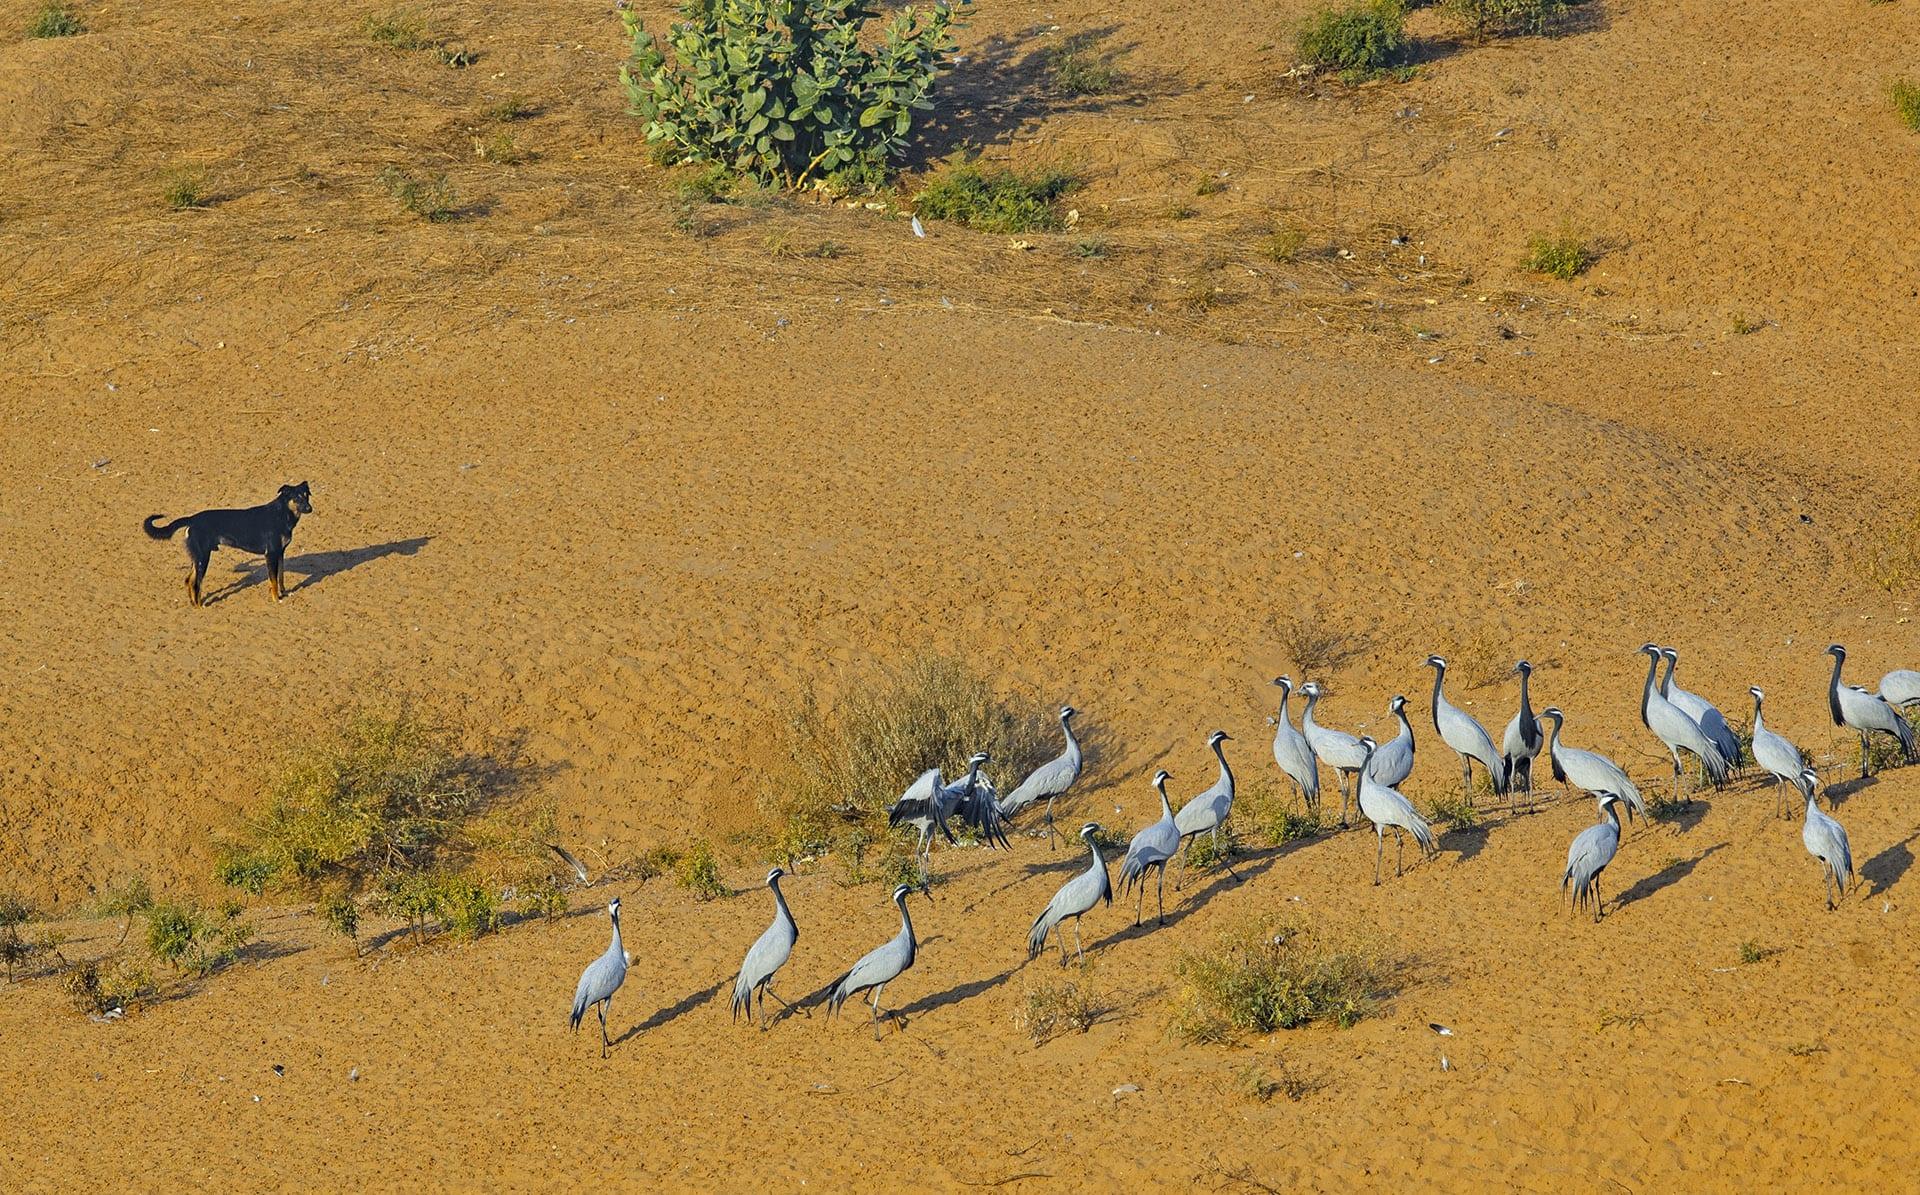 kheechan-demoiselle-crane-flock-with-free-ranging-dog